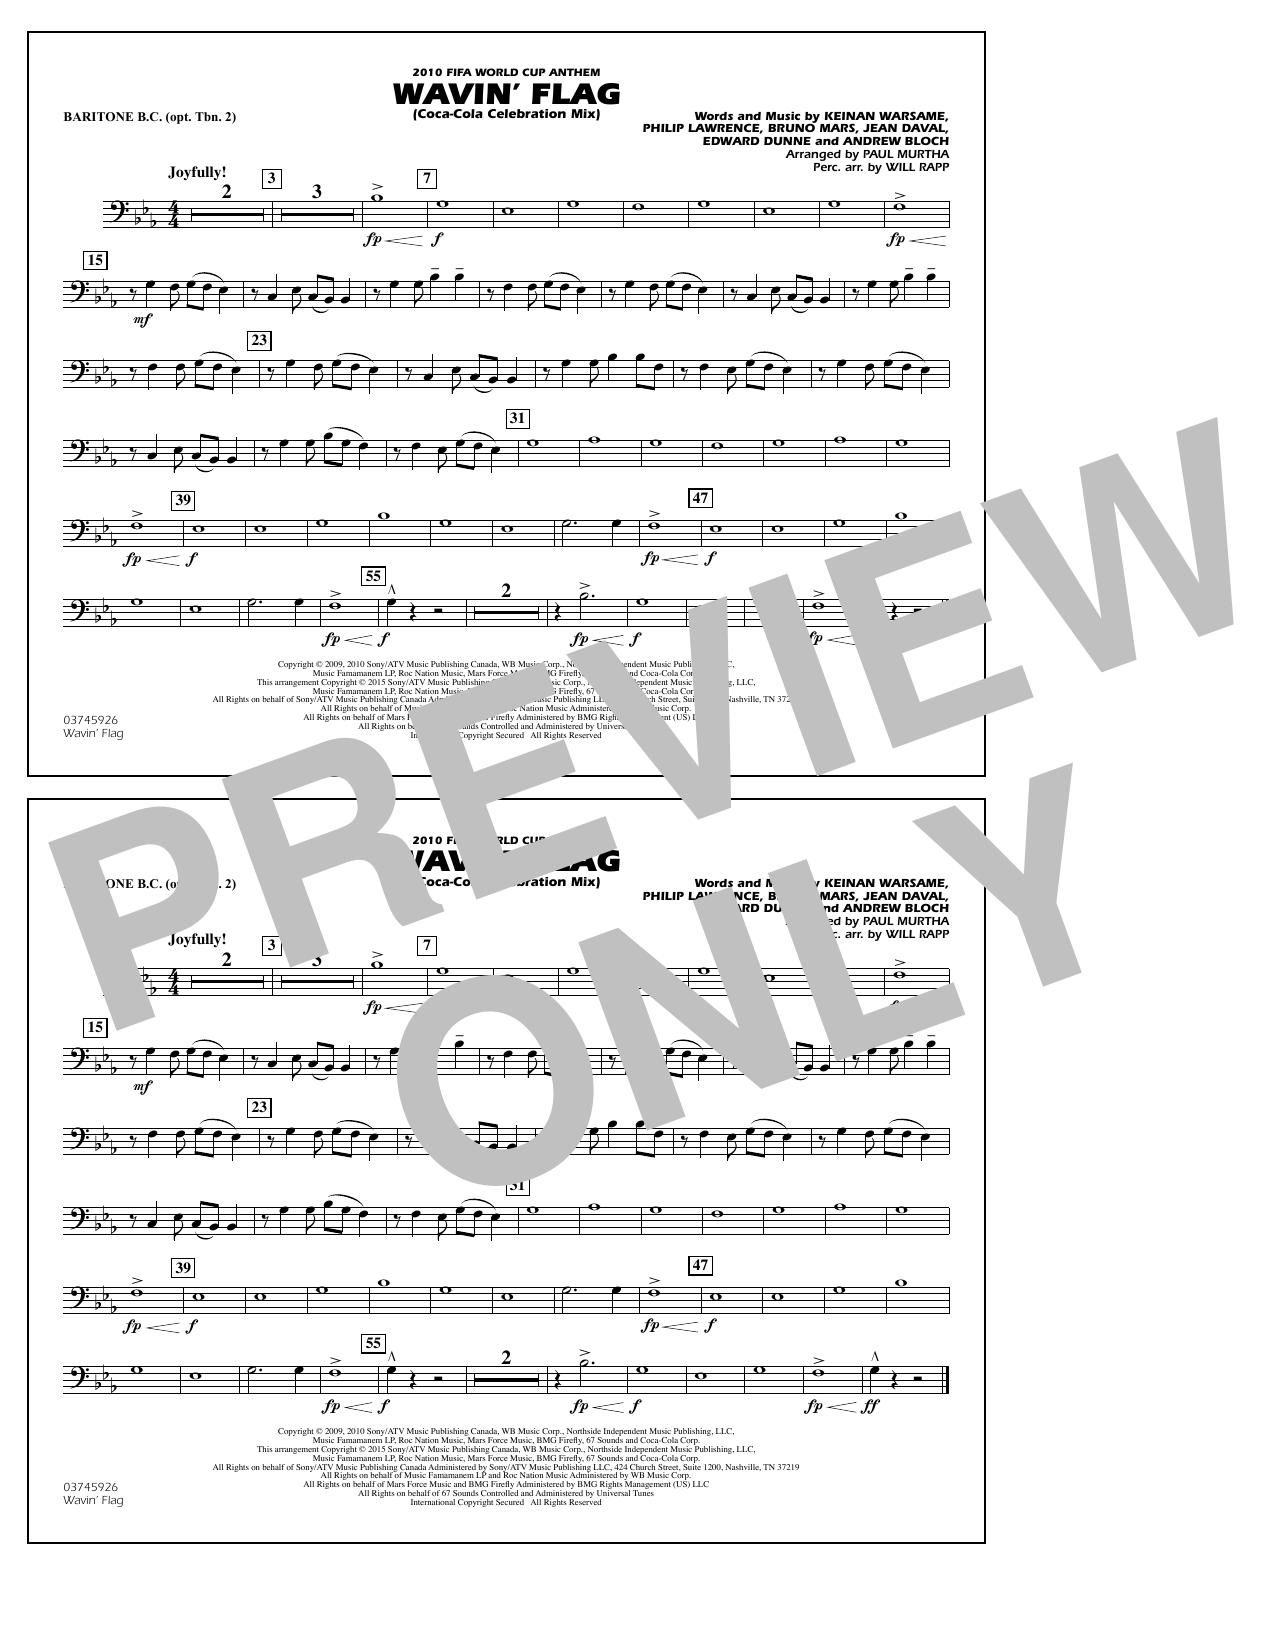 Wavin' Flag - Baritone B.C. (Opt. Tbn. 2) (Marching Band)